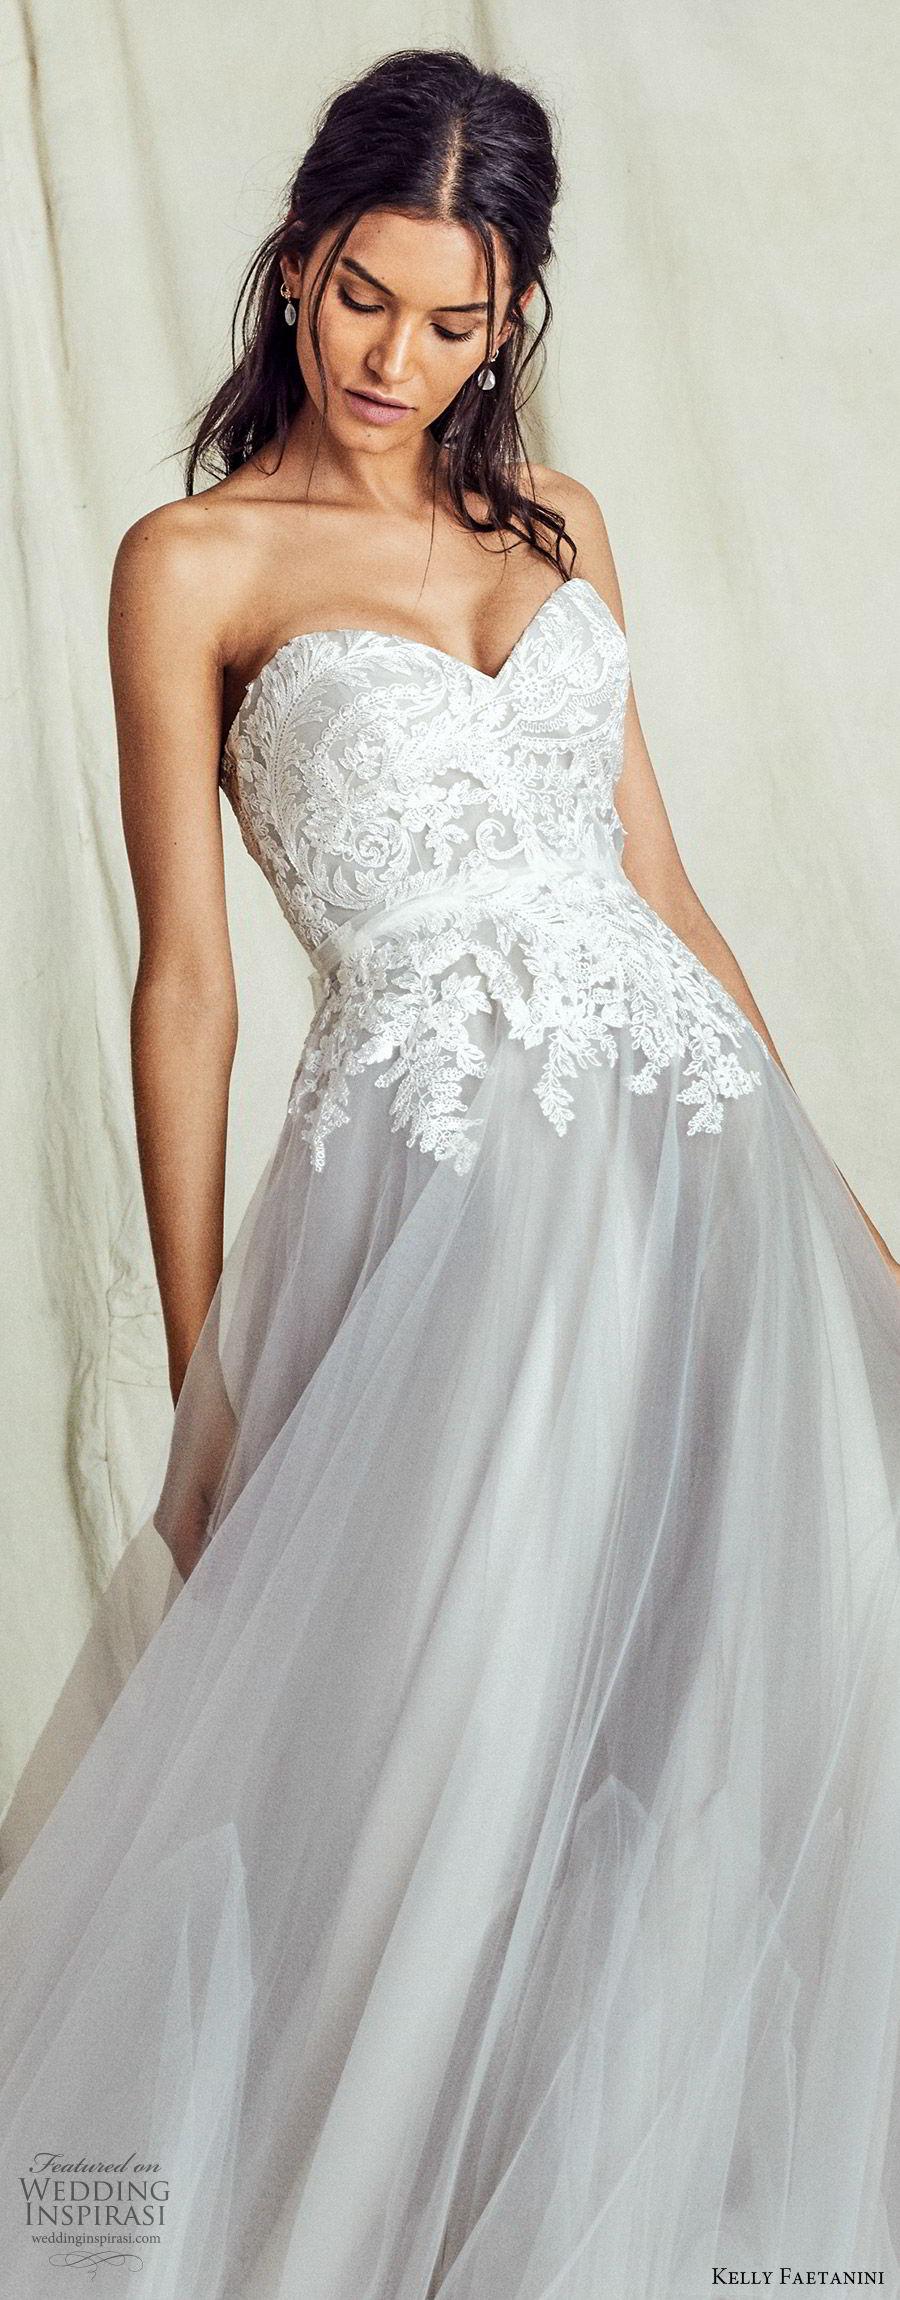 kelly faetanini fall 2019 bridal strapless sweetheart lace bodice a line ball gown wedding dress chapel train romantic elegant grey color (10) lv